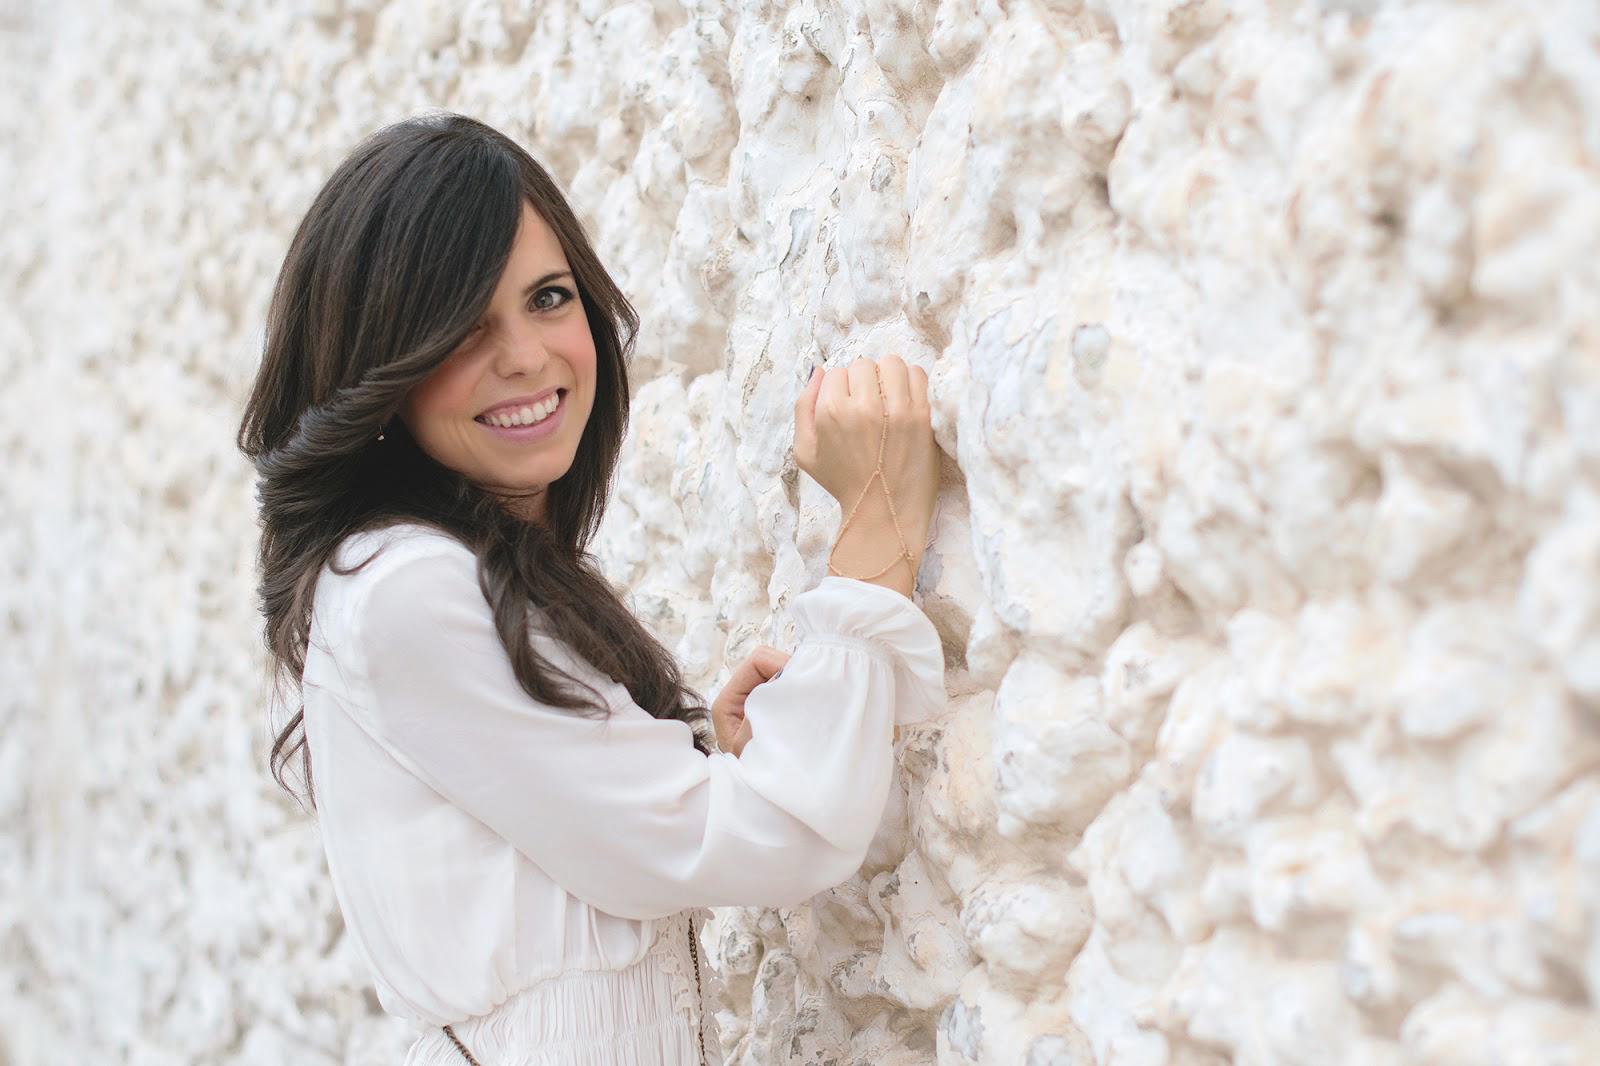 Total white de Zara para un look de noche